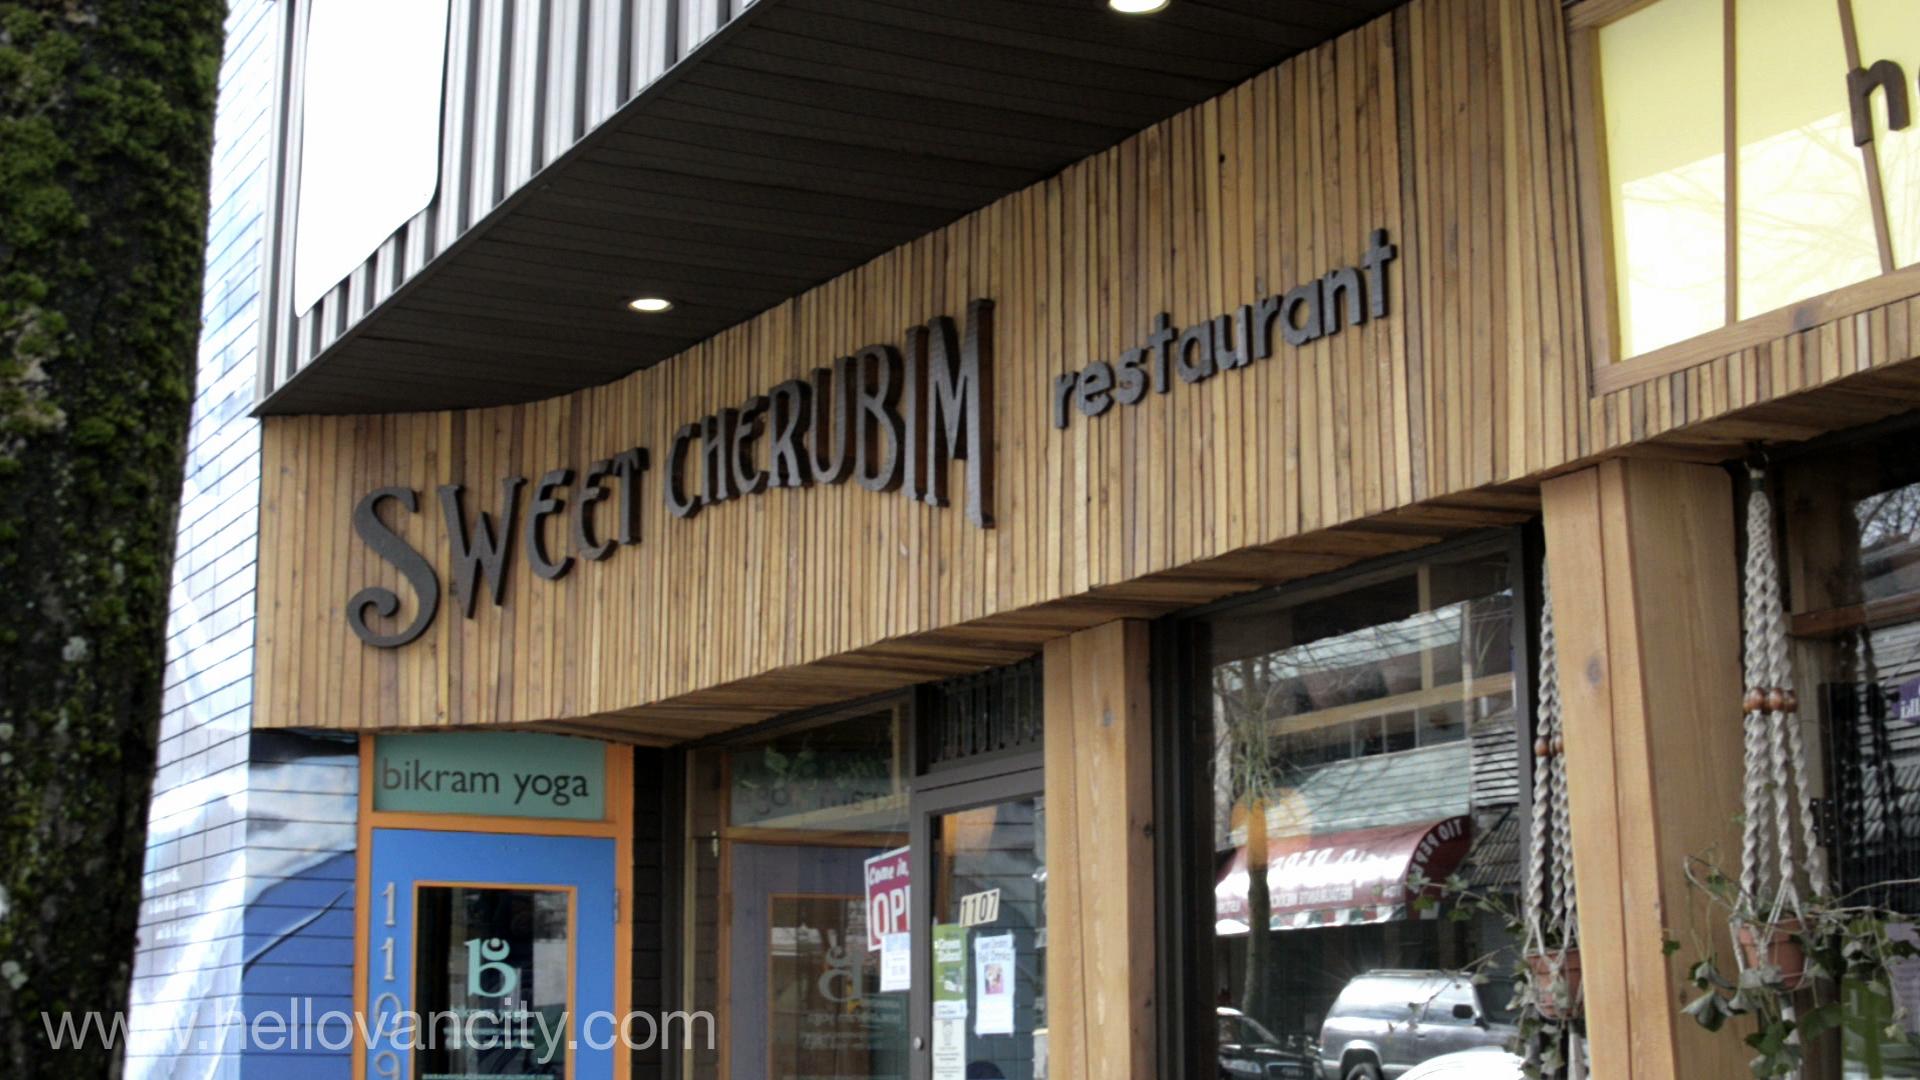 Vegan Food Stores Vancouver Bc